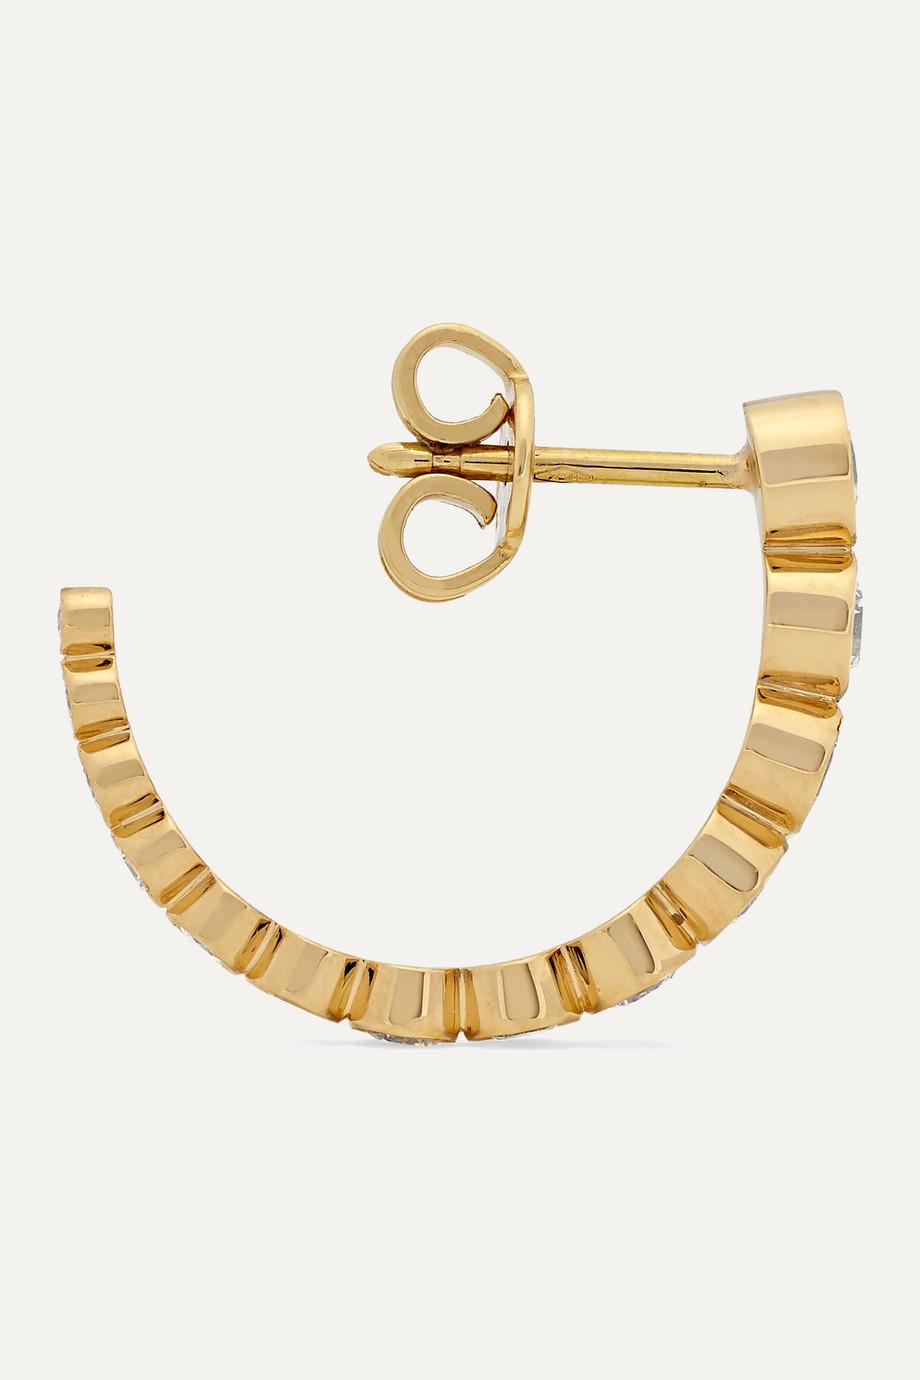 Sophie Bille Brahe Boucle Ensemble 18-karat gold diamond earrings